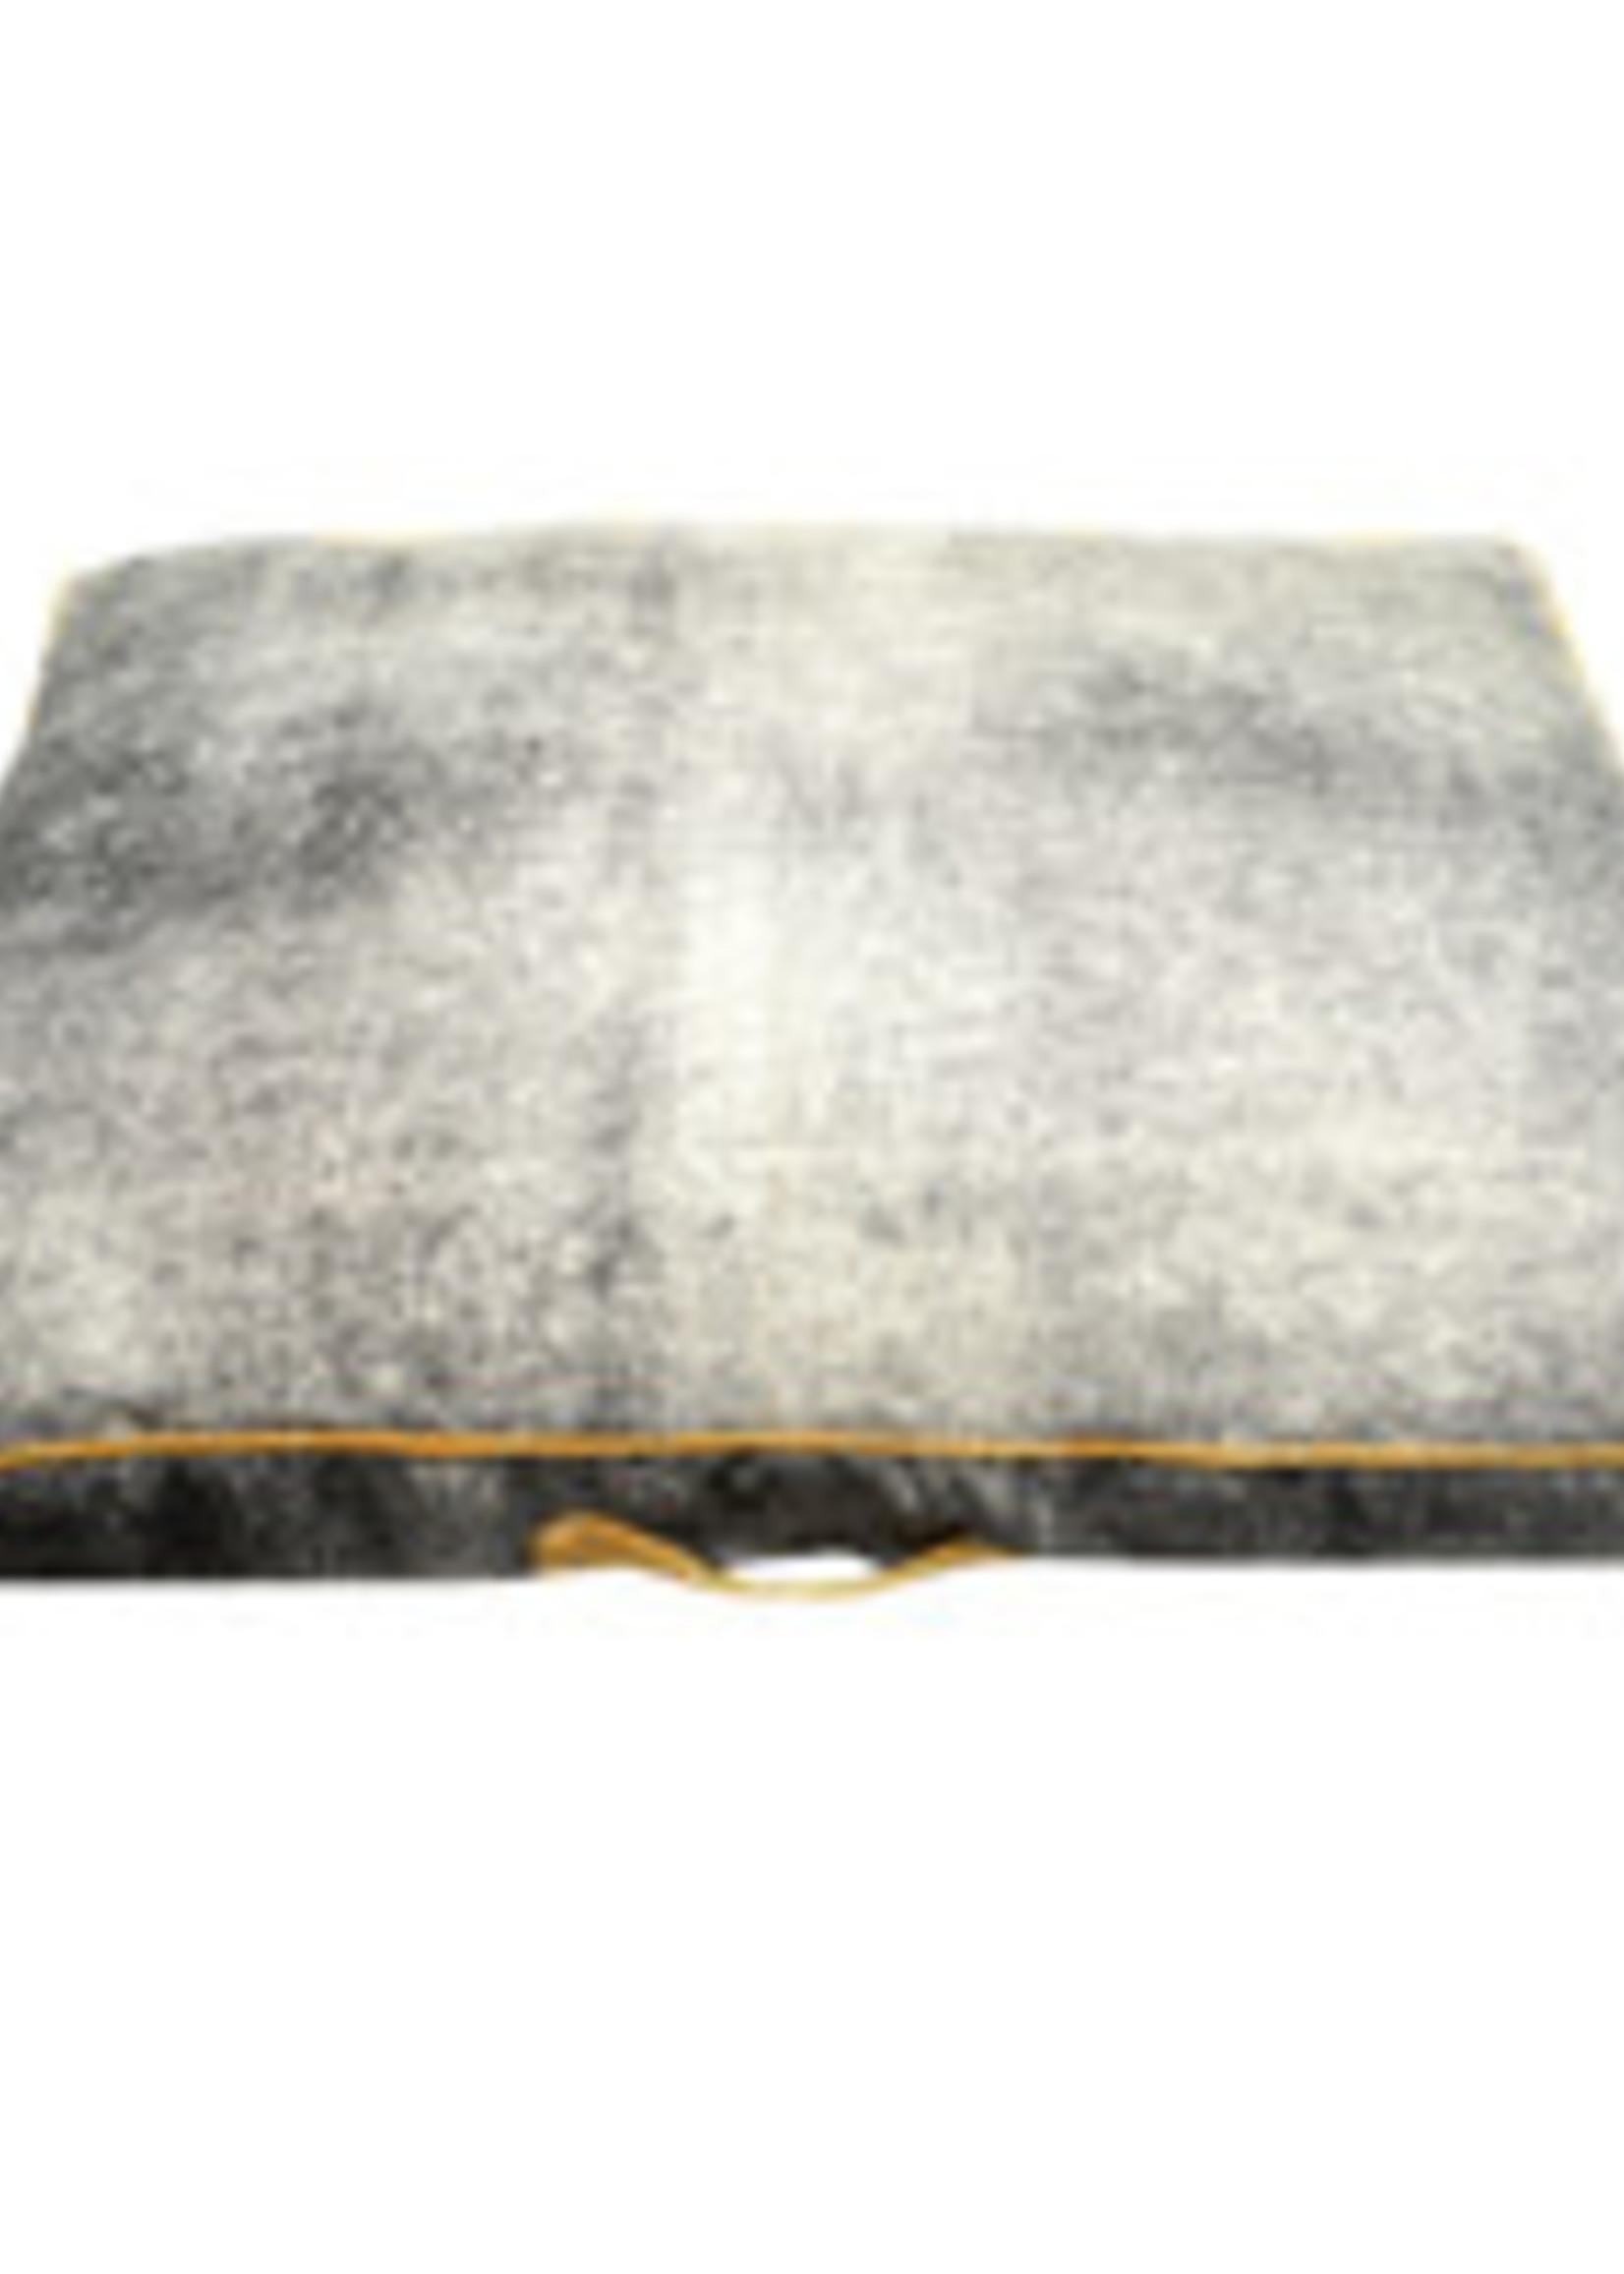 Resploot Resploot Mattress - Rectangular - Grey Smoke - 100 x 70 x 10 cm (39 x 28 x 4 in)